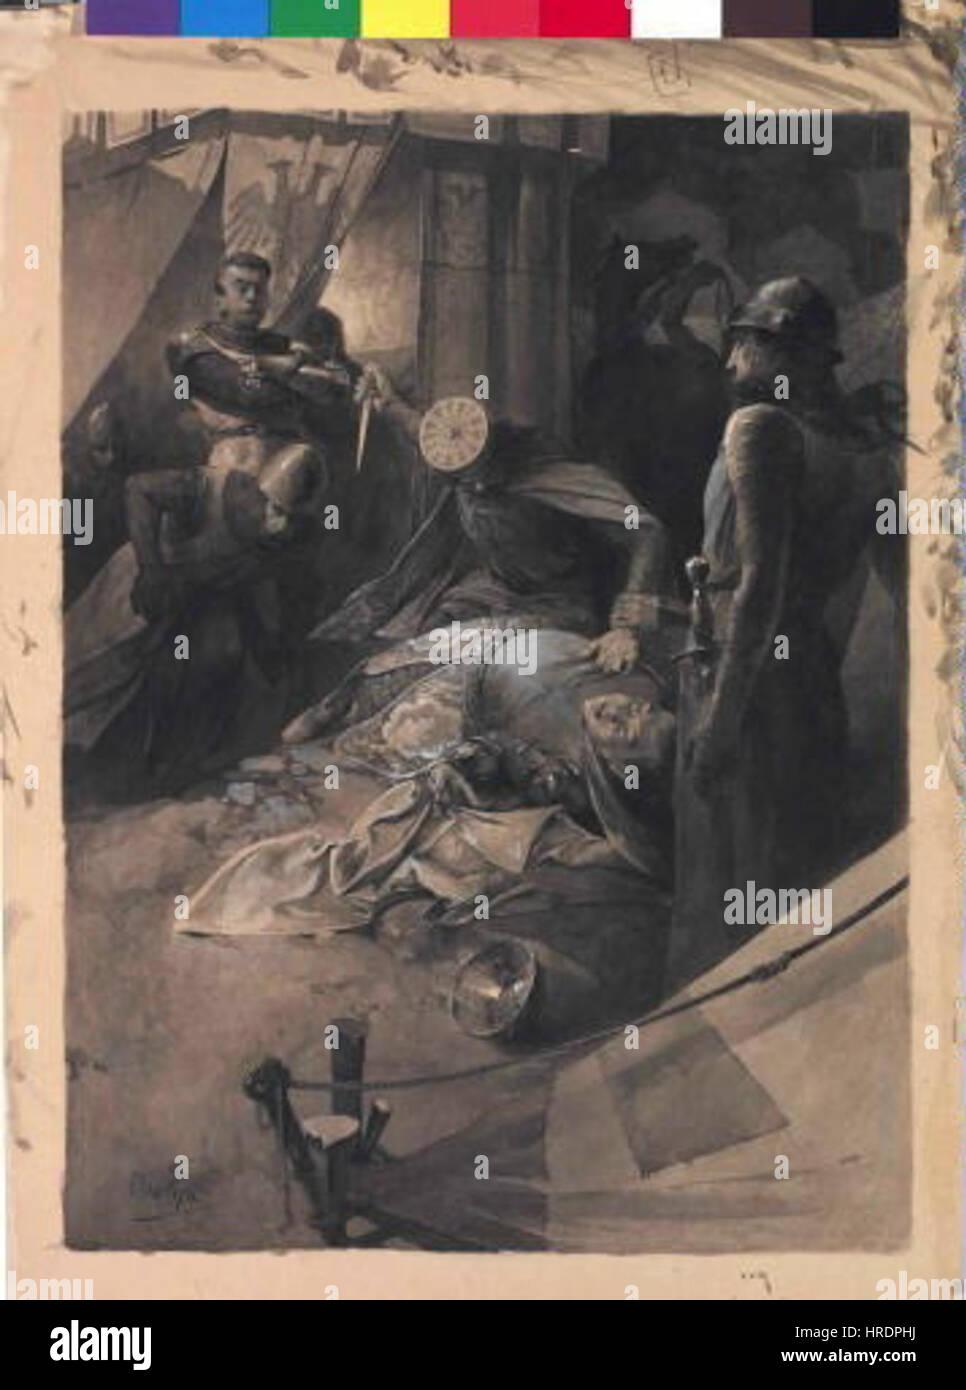 Autor Alfons Mucha 24.7.1860-14.7.1939 - Smrt Valdstejna - ilustrace ke Scenes et episodes de lhistoire dAllemagne Stock Photo